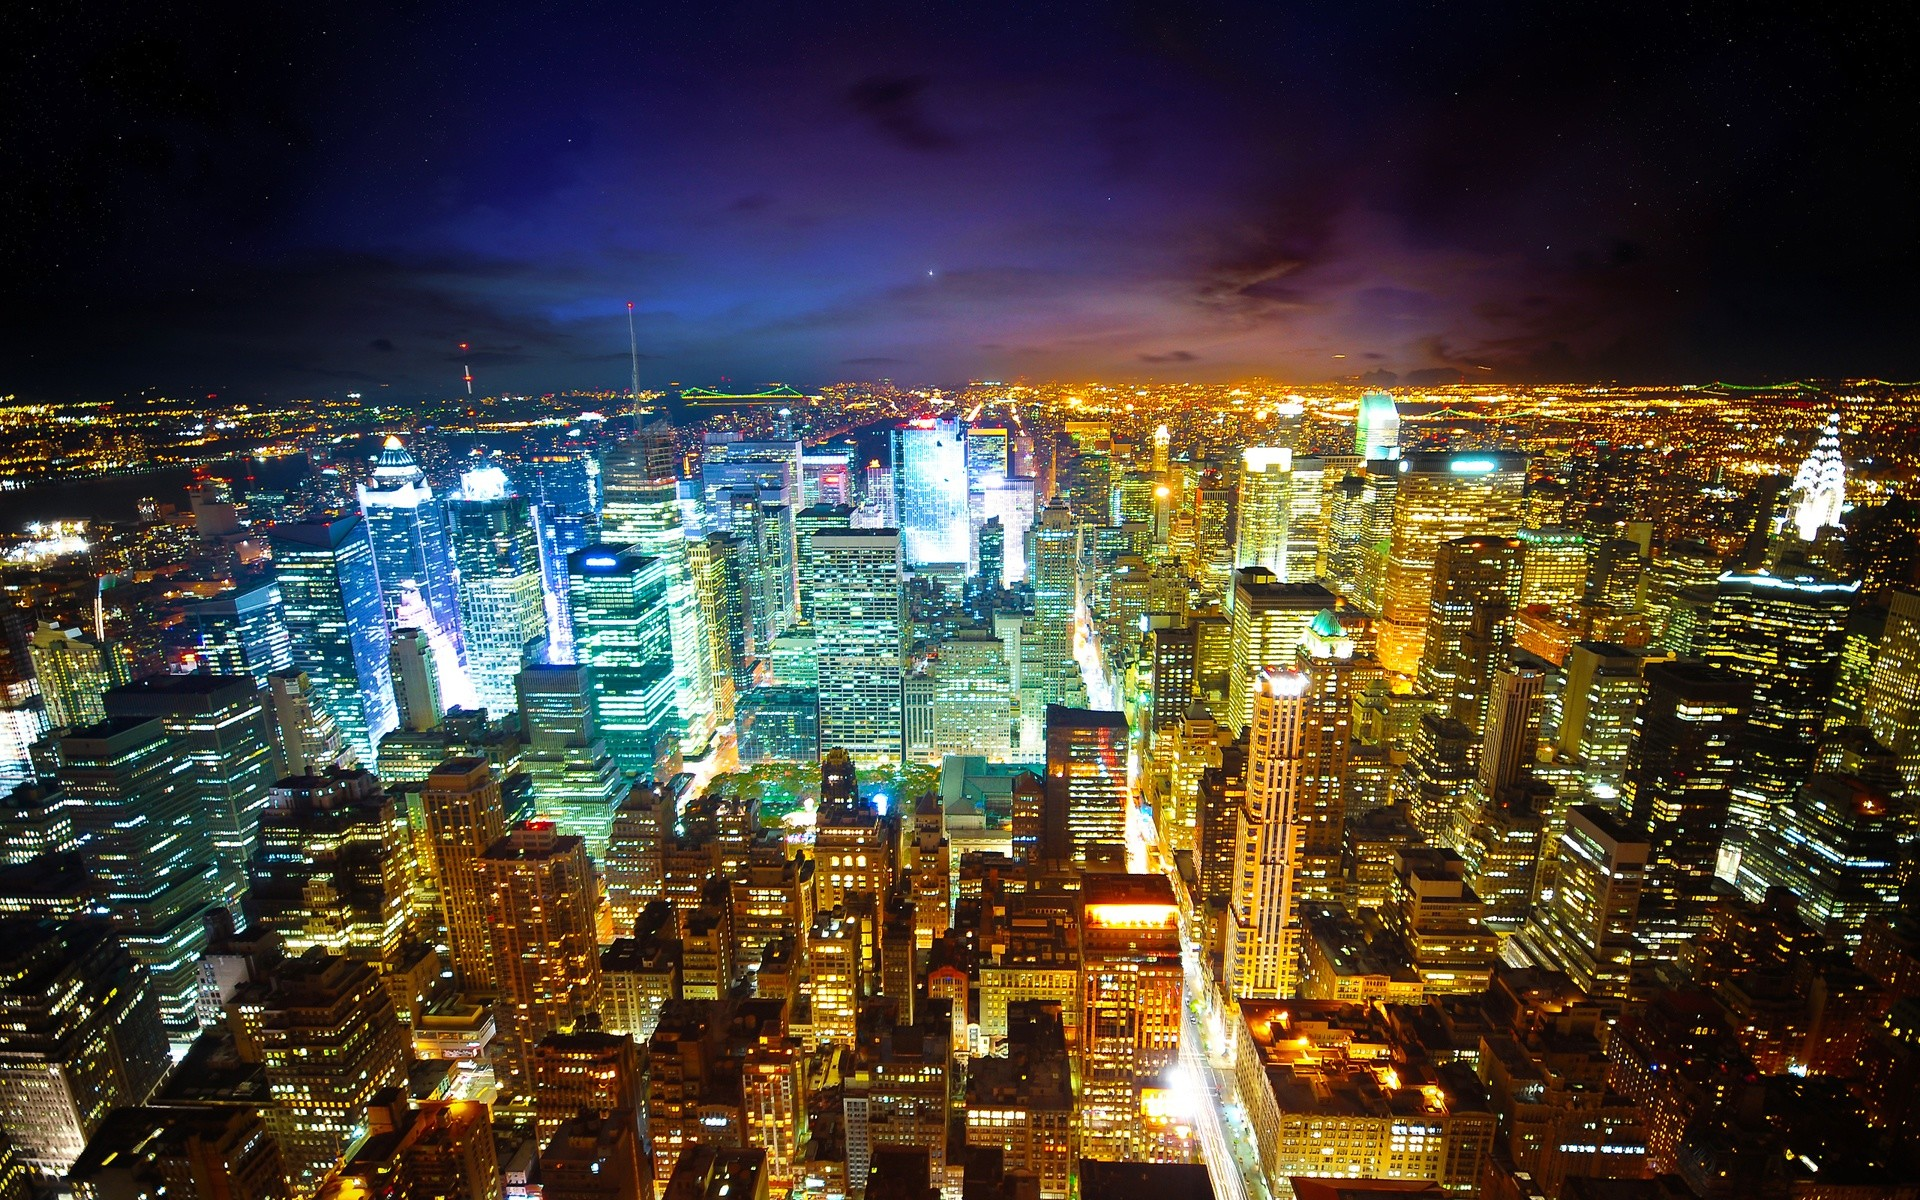 Paris The Illuminated City HD Desktop Wallpaper